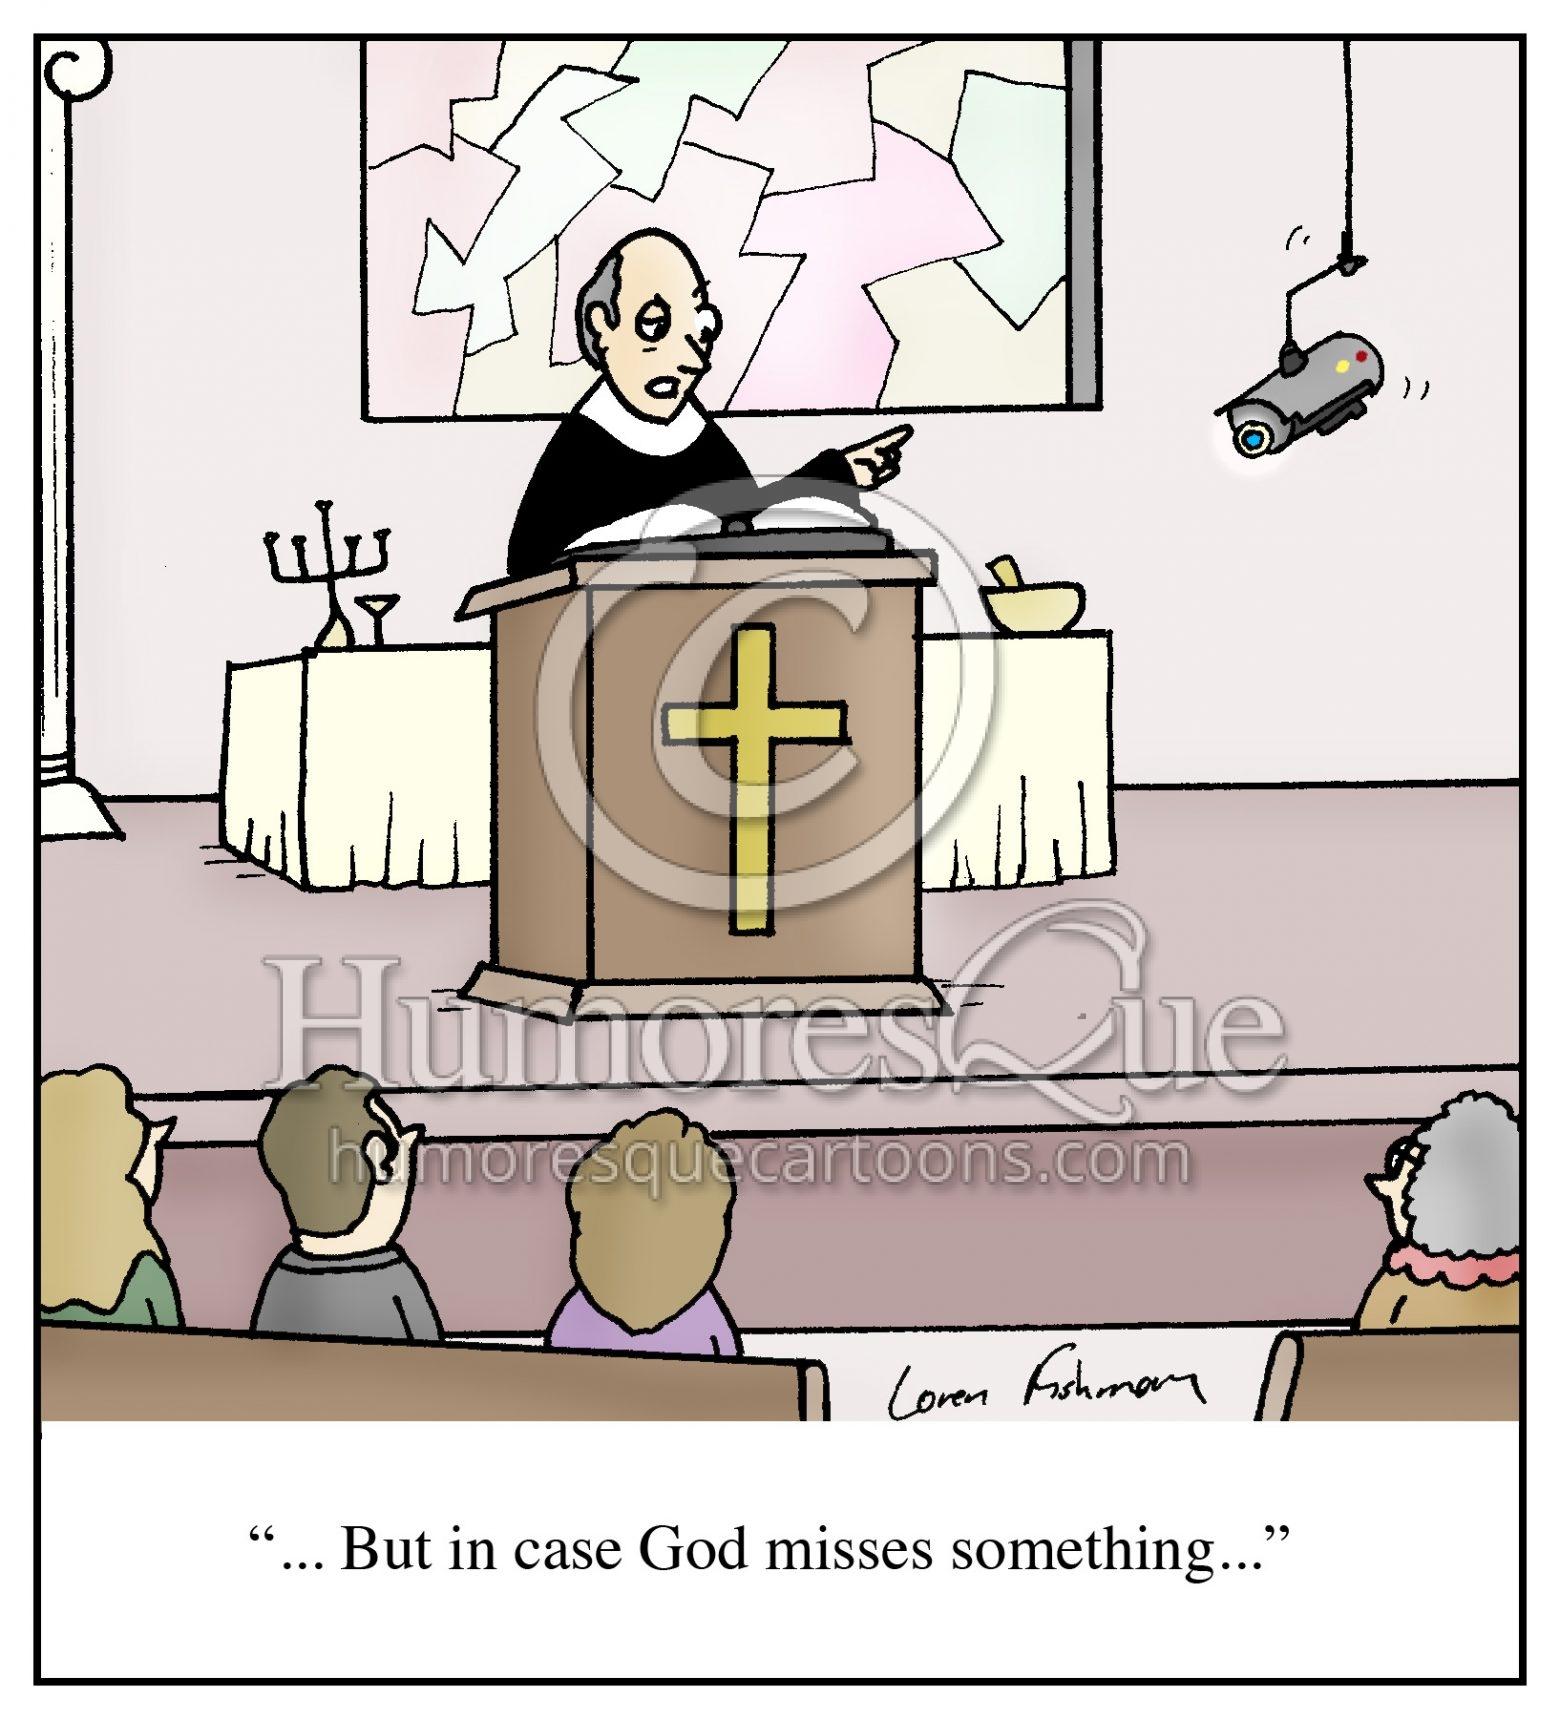 surveillance camera in church cartoon